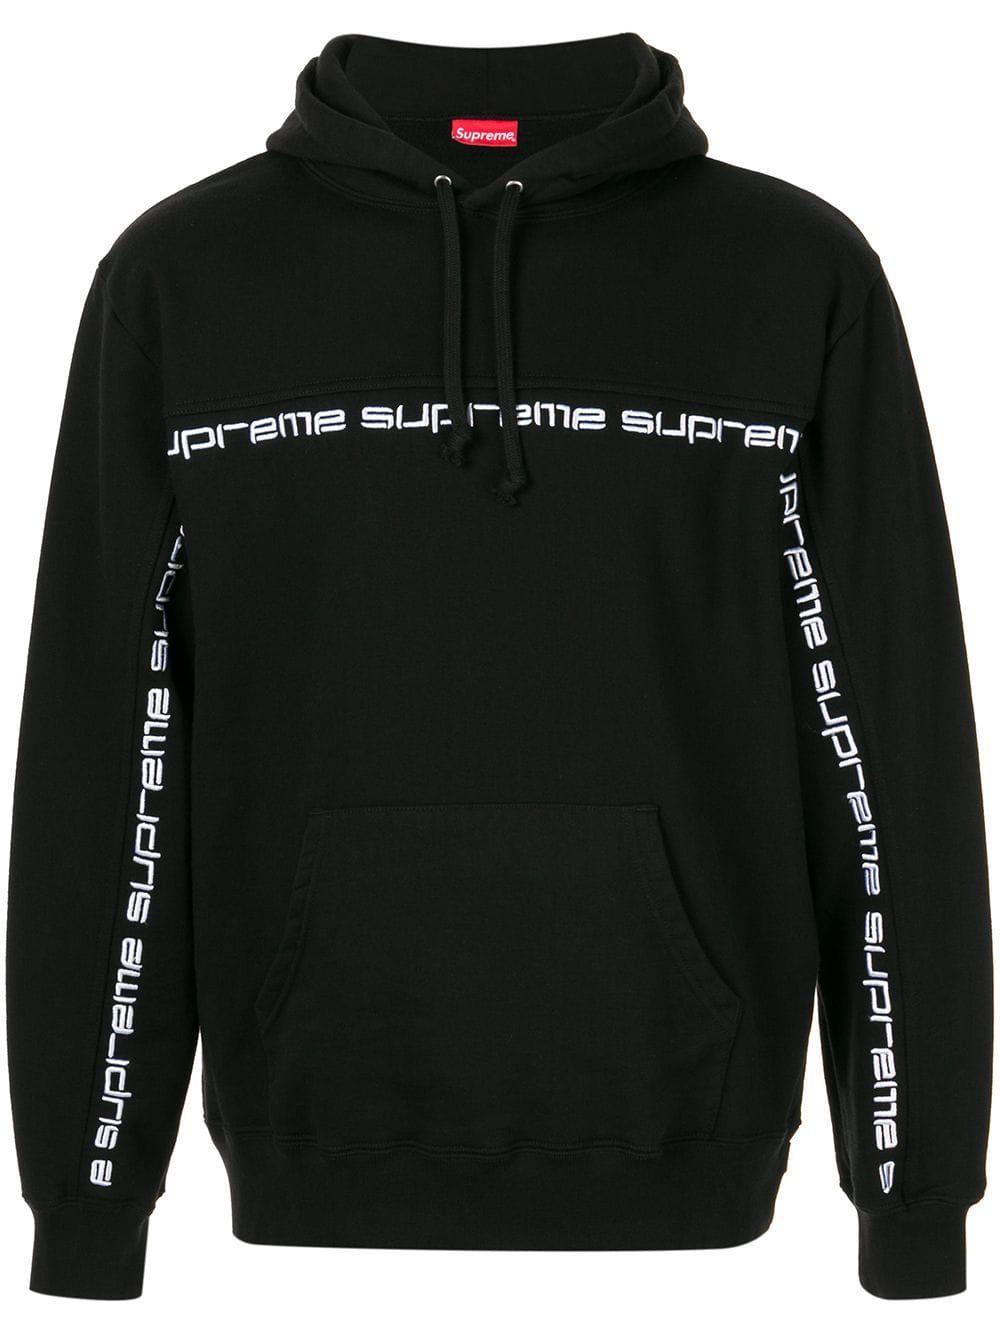 Supreme Text Stripe Hooded Sweatshirt Farfetch Hooded Sweatshirts Supreme Sweatshirt Sweatshirts [ 1334 x 1000 Pixel ]